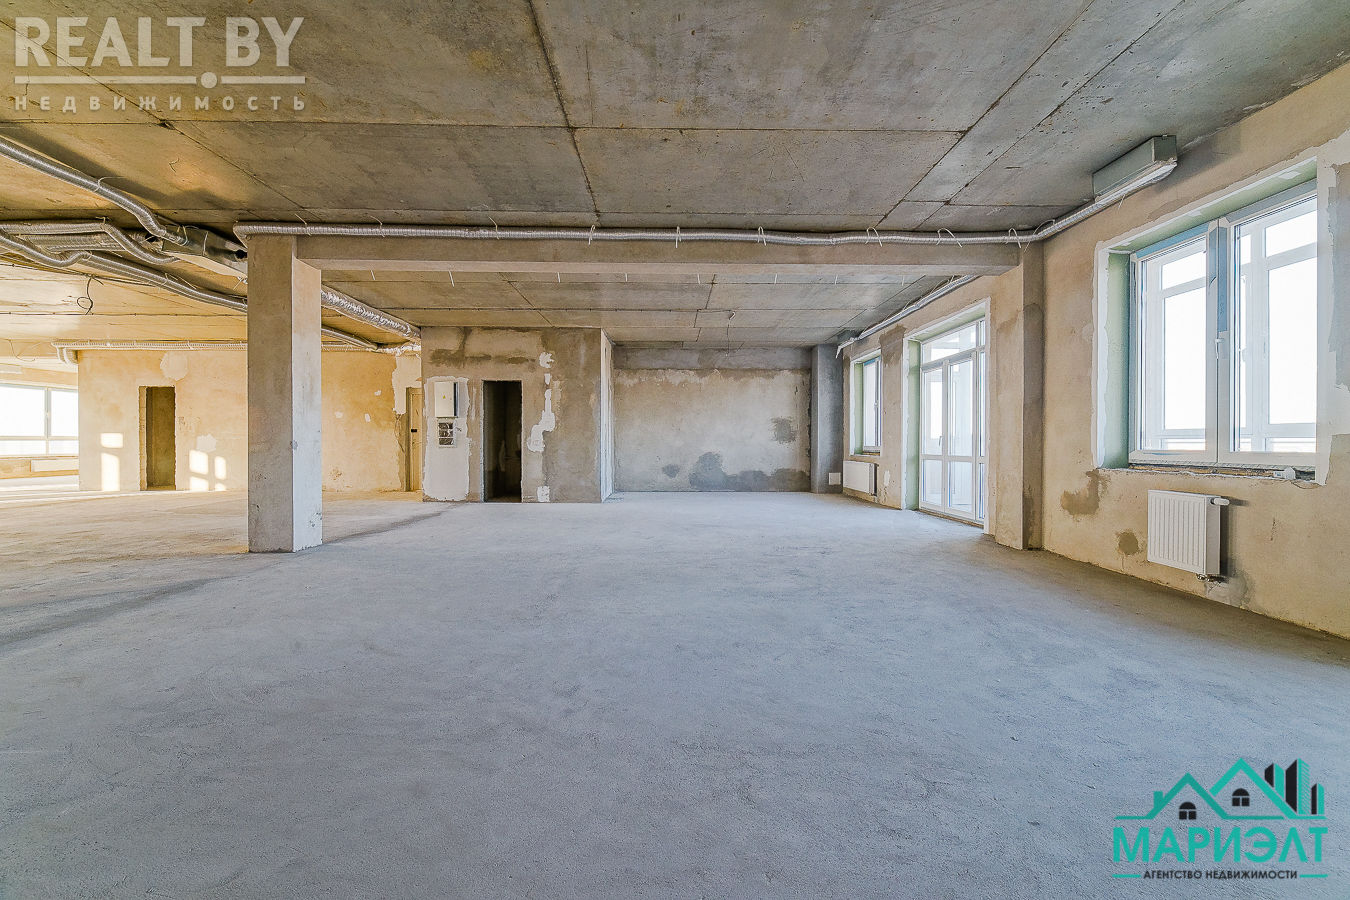 Продается 4-х комнатная квартира, ул. Сторожовская д.6 - фото №9